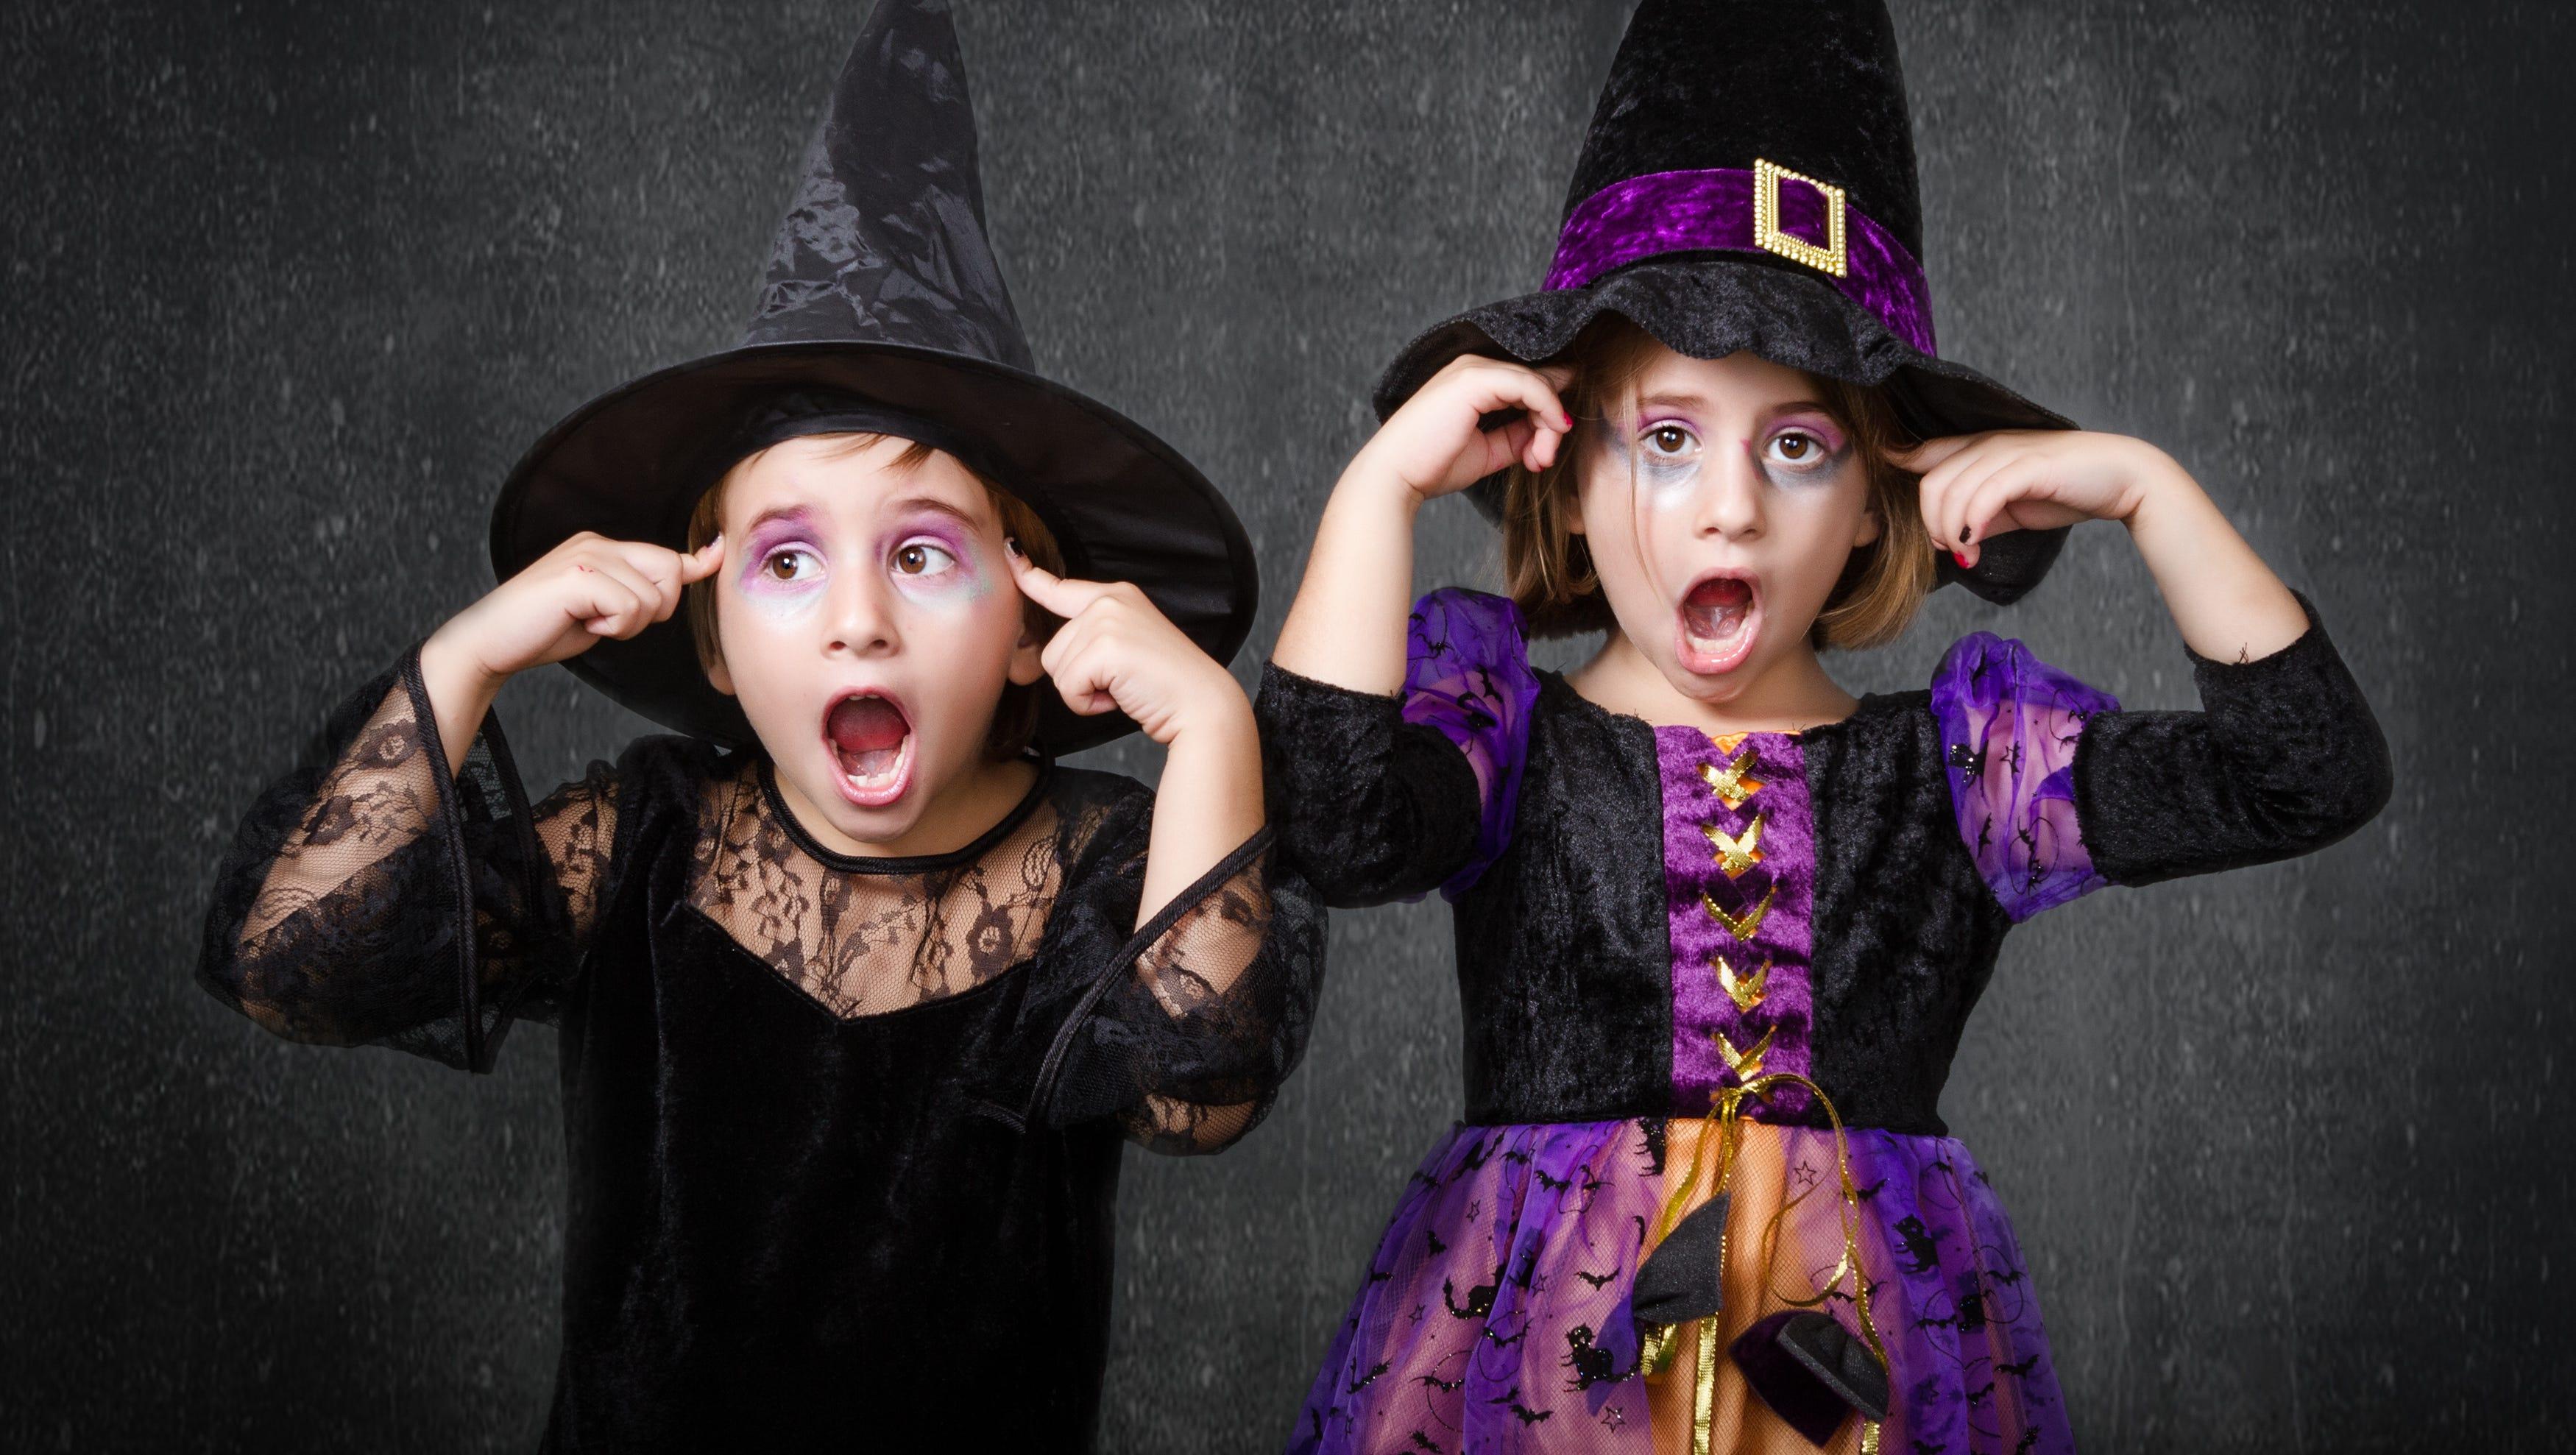 Free Halloween Costumes halloween costumes dresses Day 1 Win A Free Halloween Costume